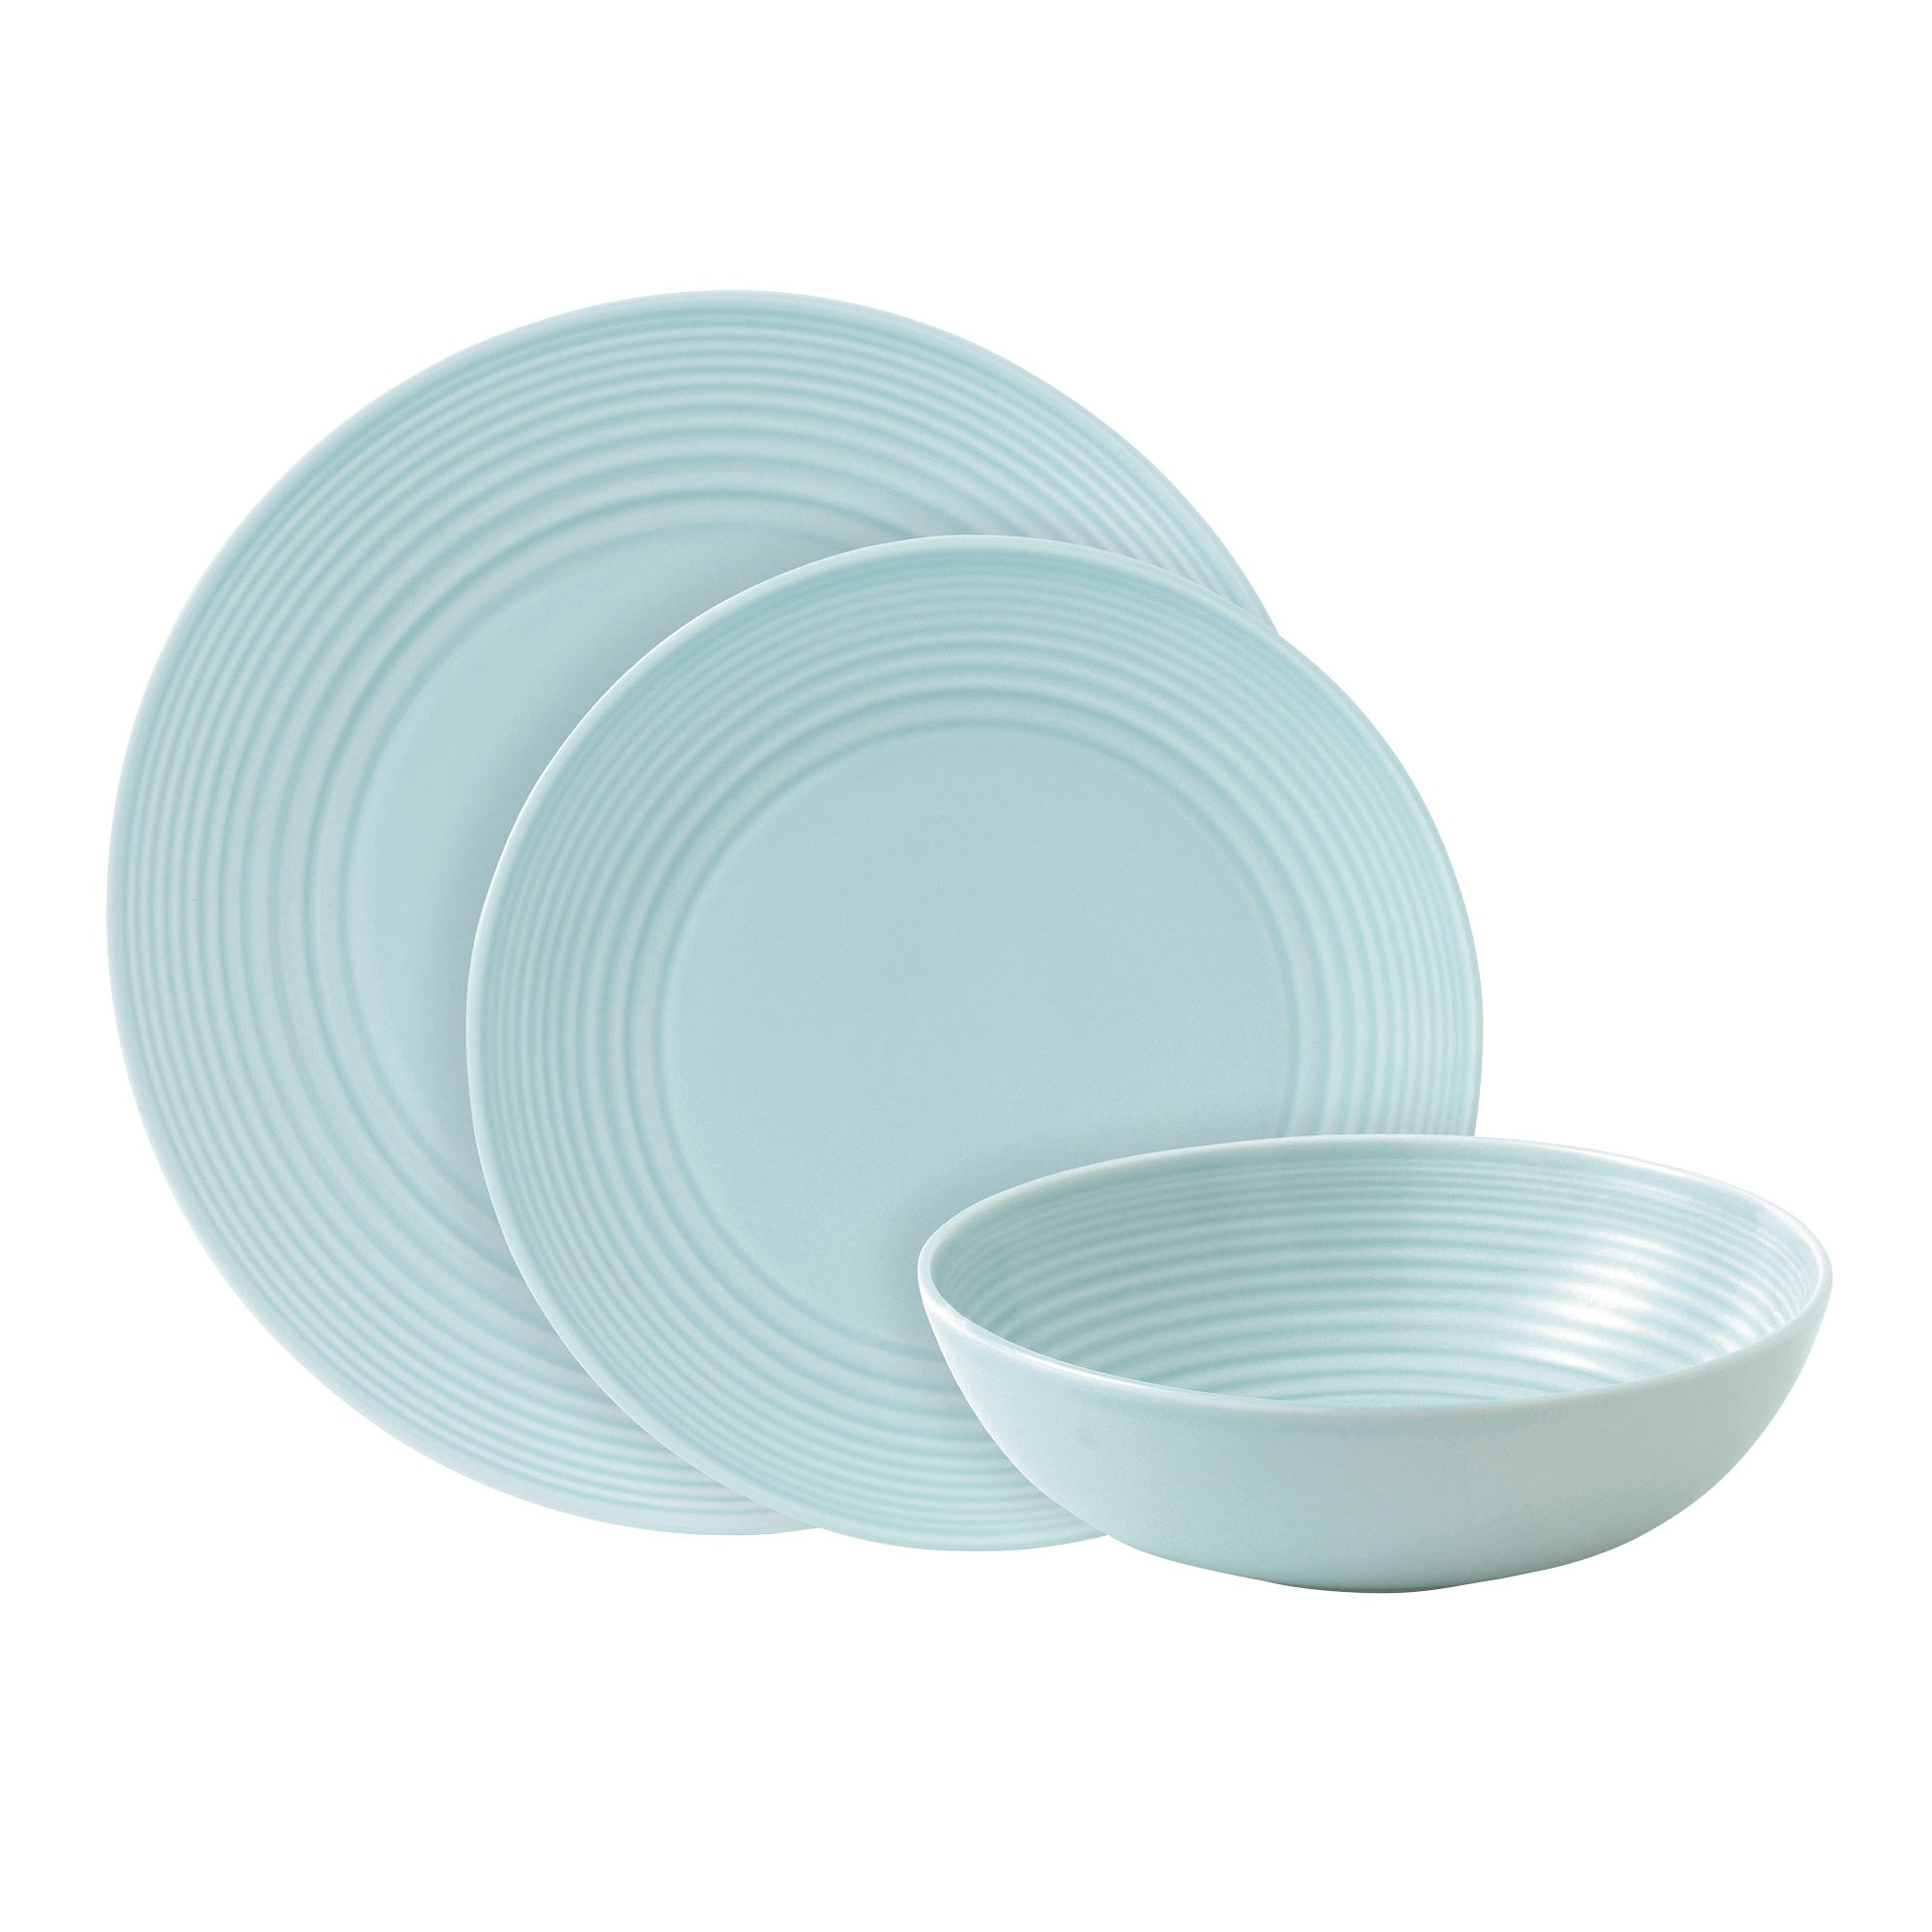 Blue Gordon Ramsay Maze Collection 12 Piece Dinner Set